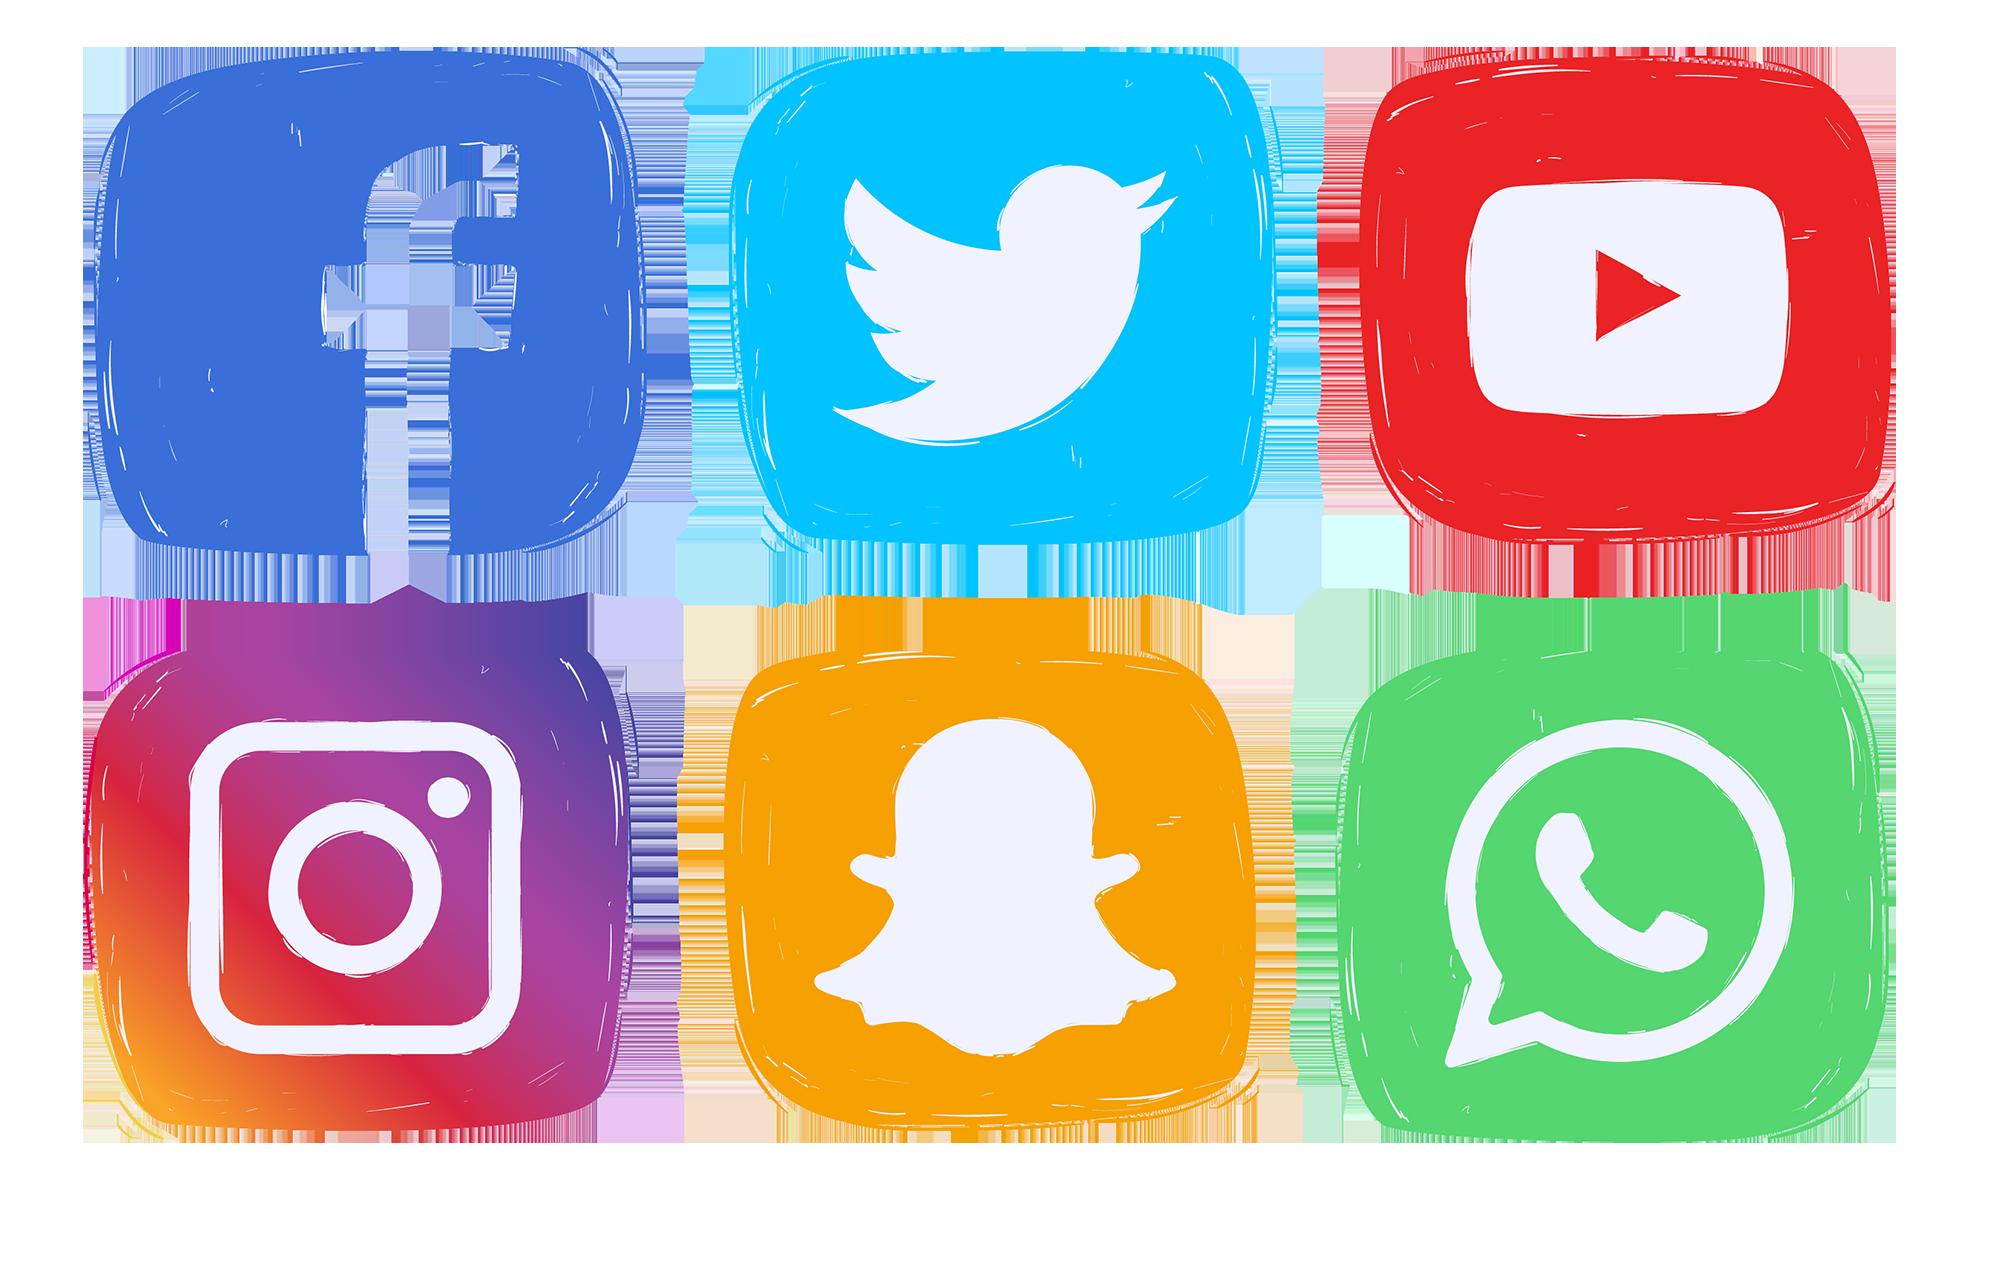 Network clipart social acceptance, Network social ...